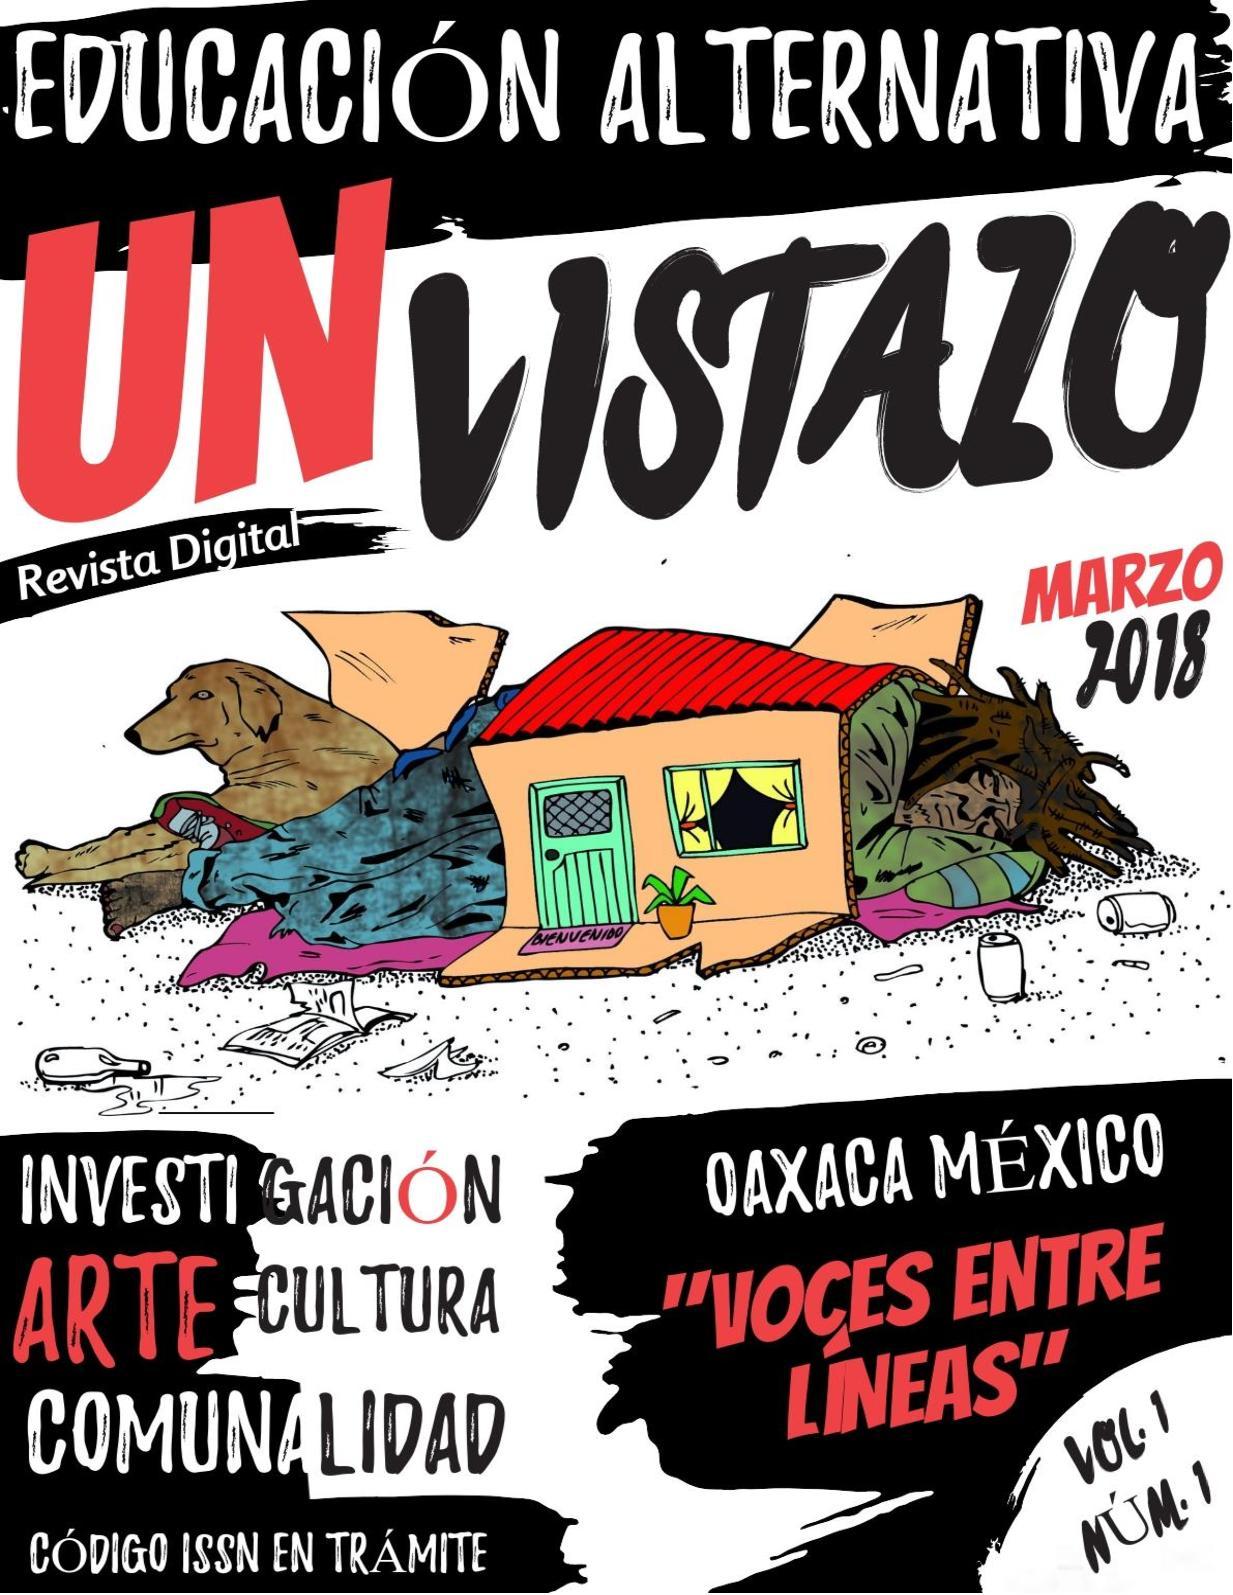 Calaméo - Revista Digital Educación Alternativa